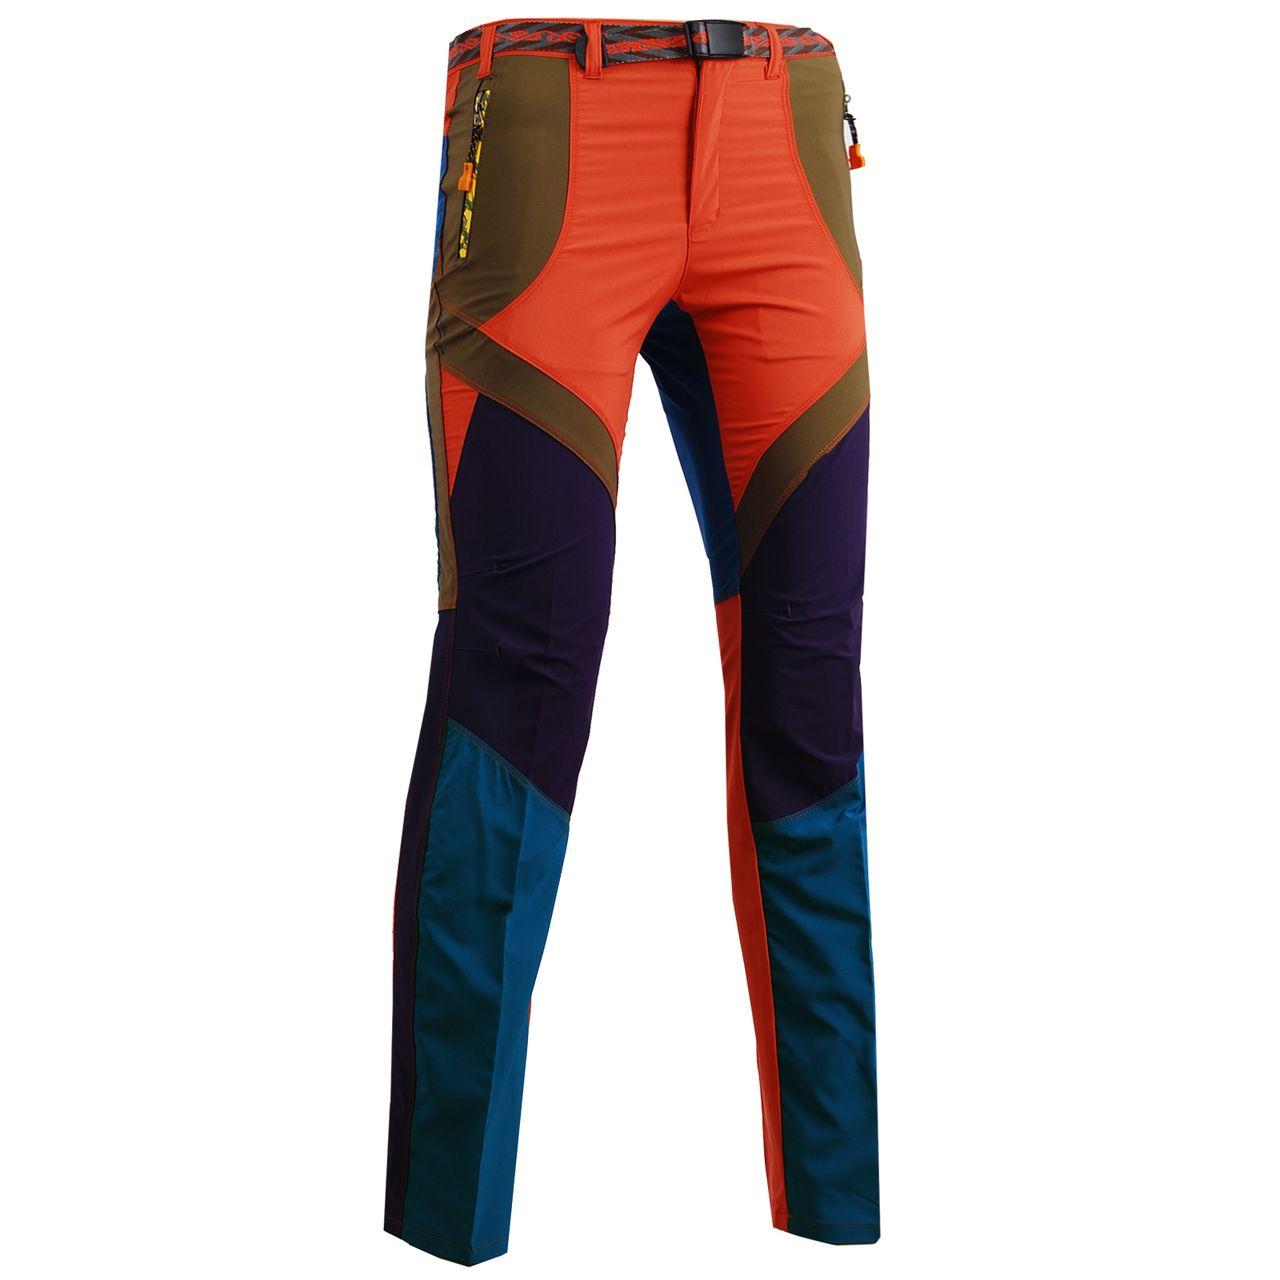 Zipravs lightweight hiking trekking pants trousers for ...